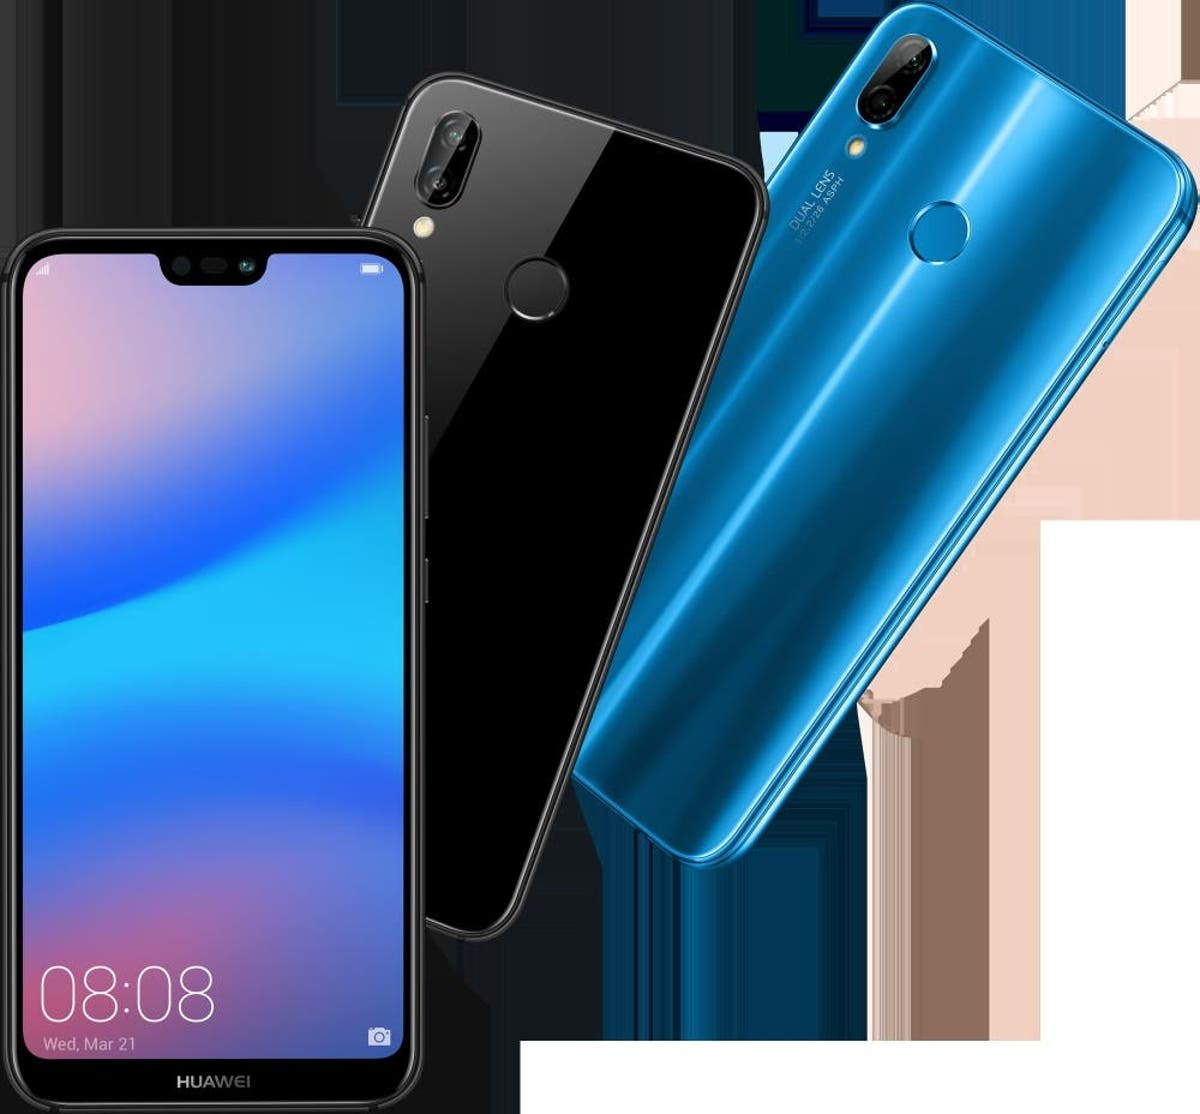 Huawei Nova 3E price and full specs revealed, tipped to sport a 5.8-inch  18:9 display - Gizchina.com